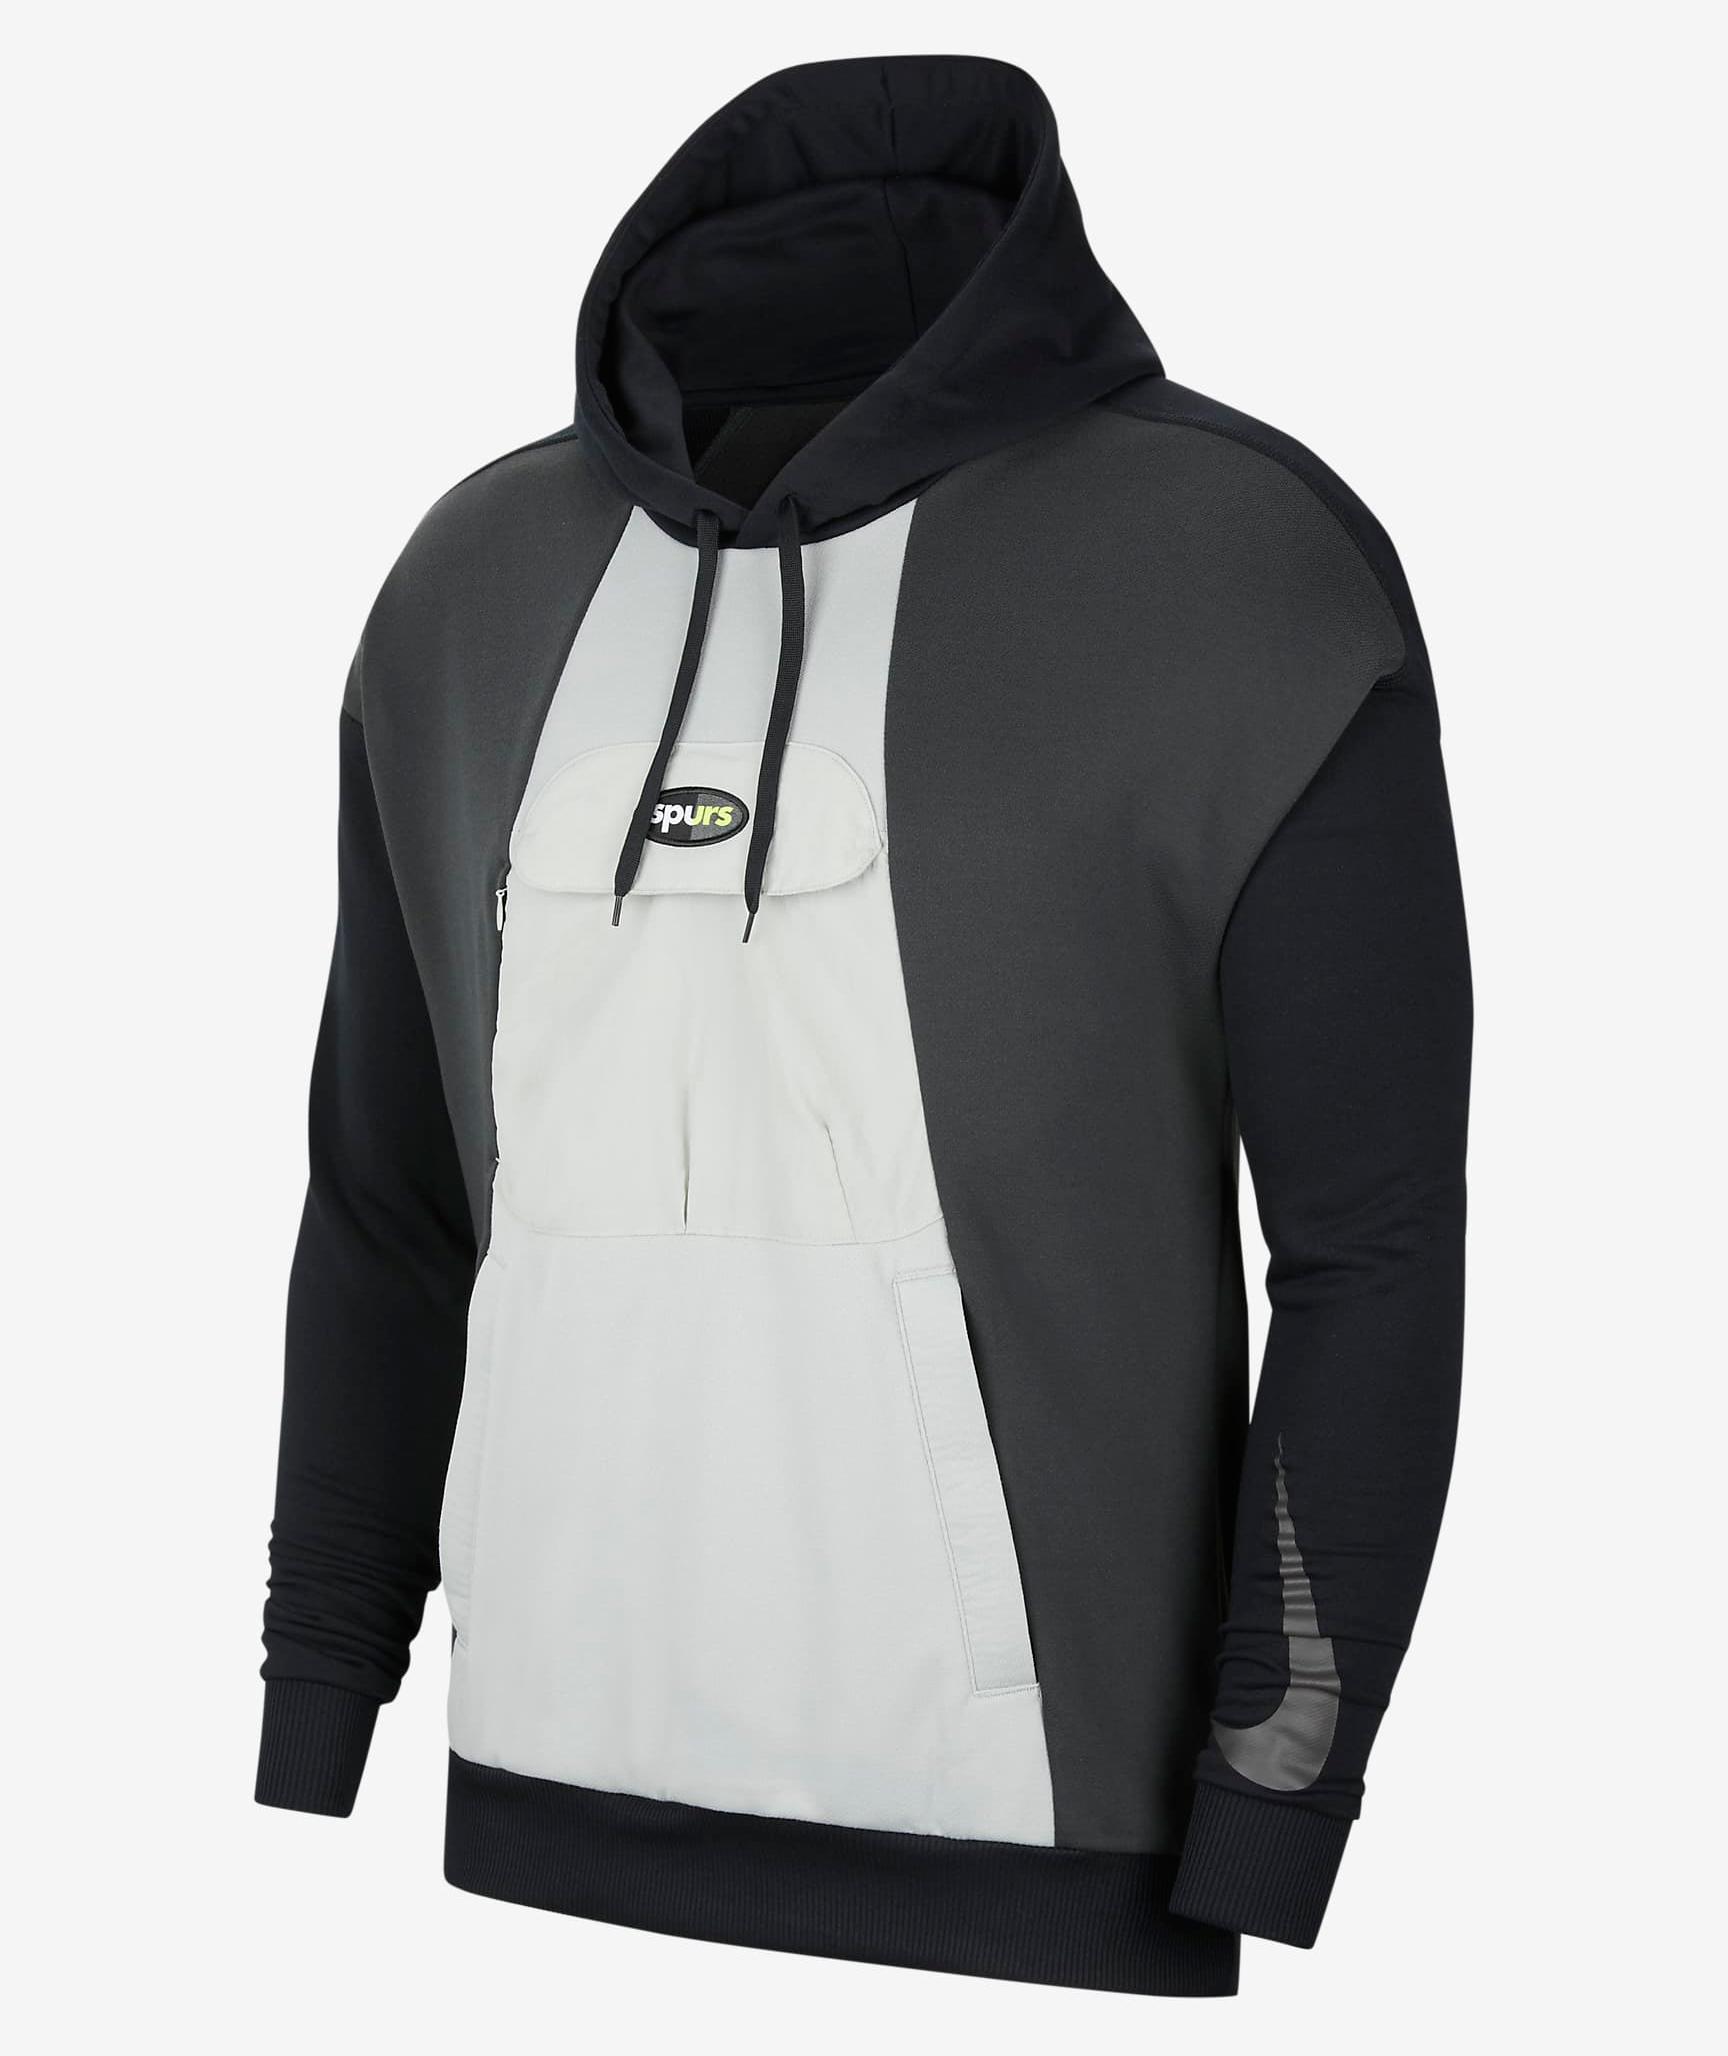 nike-tottenham-hotspur-air-max-95-hoodie-1